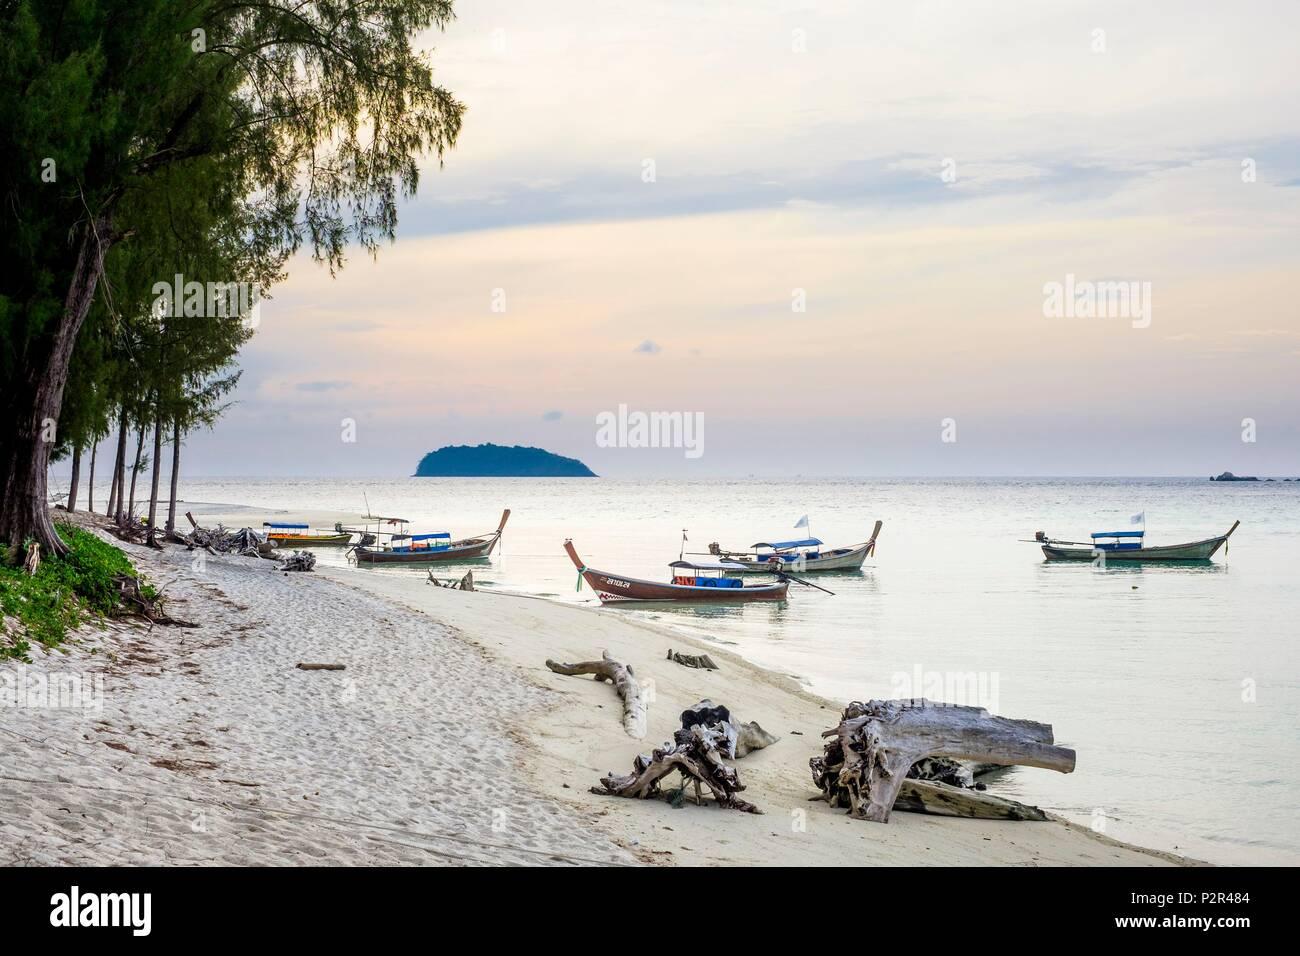 Thailand, Satun province, Tarutao National Marine Park, Ko Adang island, traditional long tail boats on Laem Son beach - Stock Image